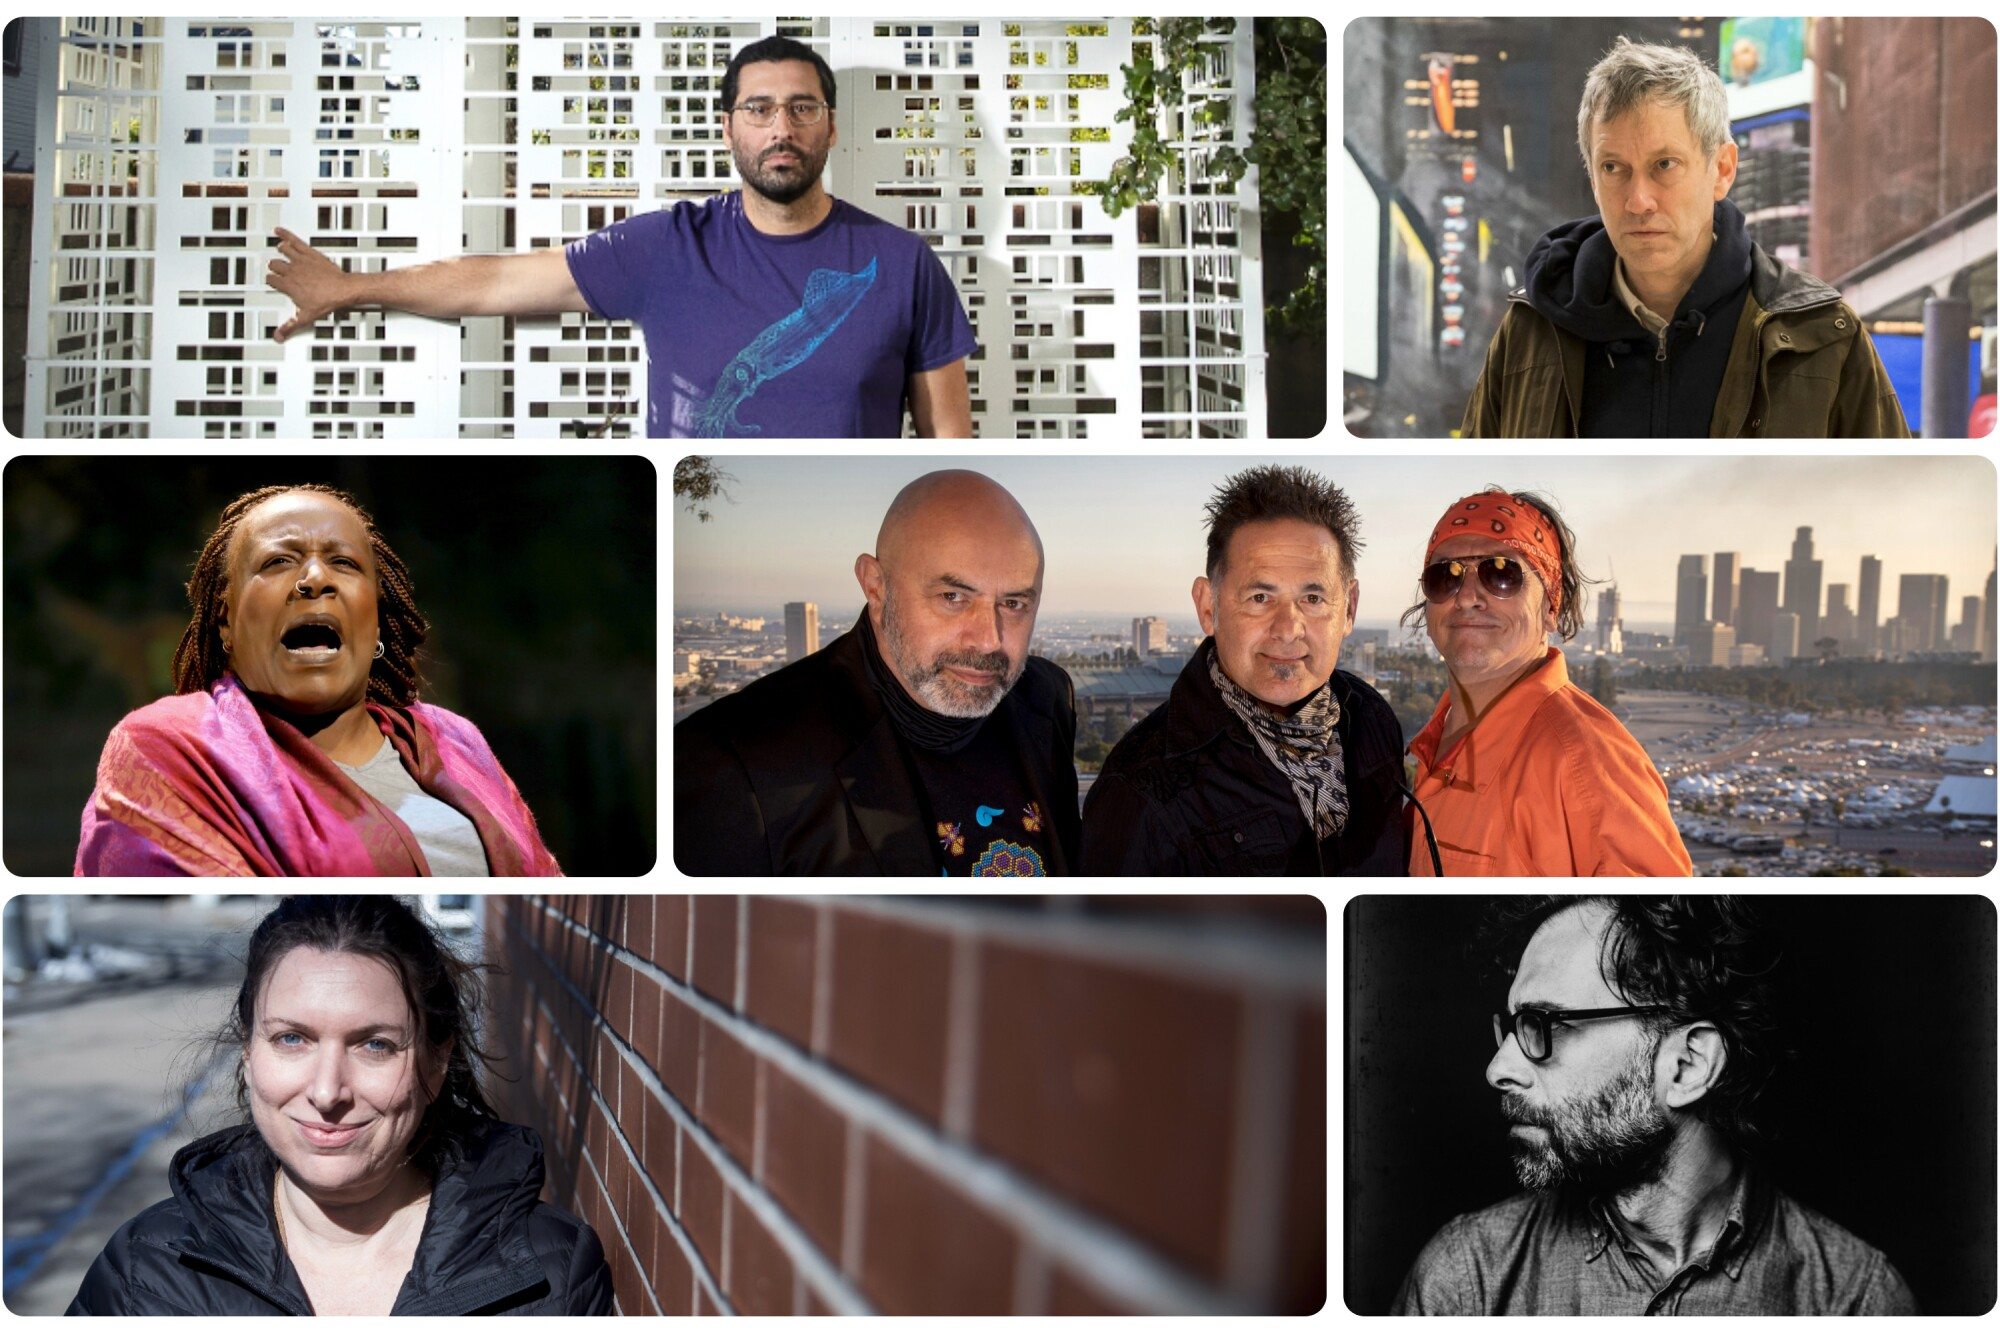 A photo montage of Lars Jan, Richard Maxwell, Culture Clash, Daniel Fish, Annie Dorsen and Dael Orlandersmith.